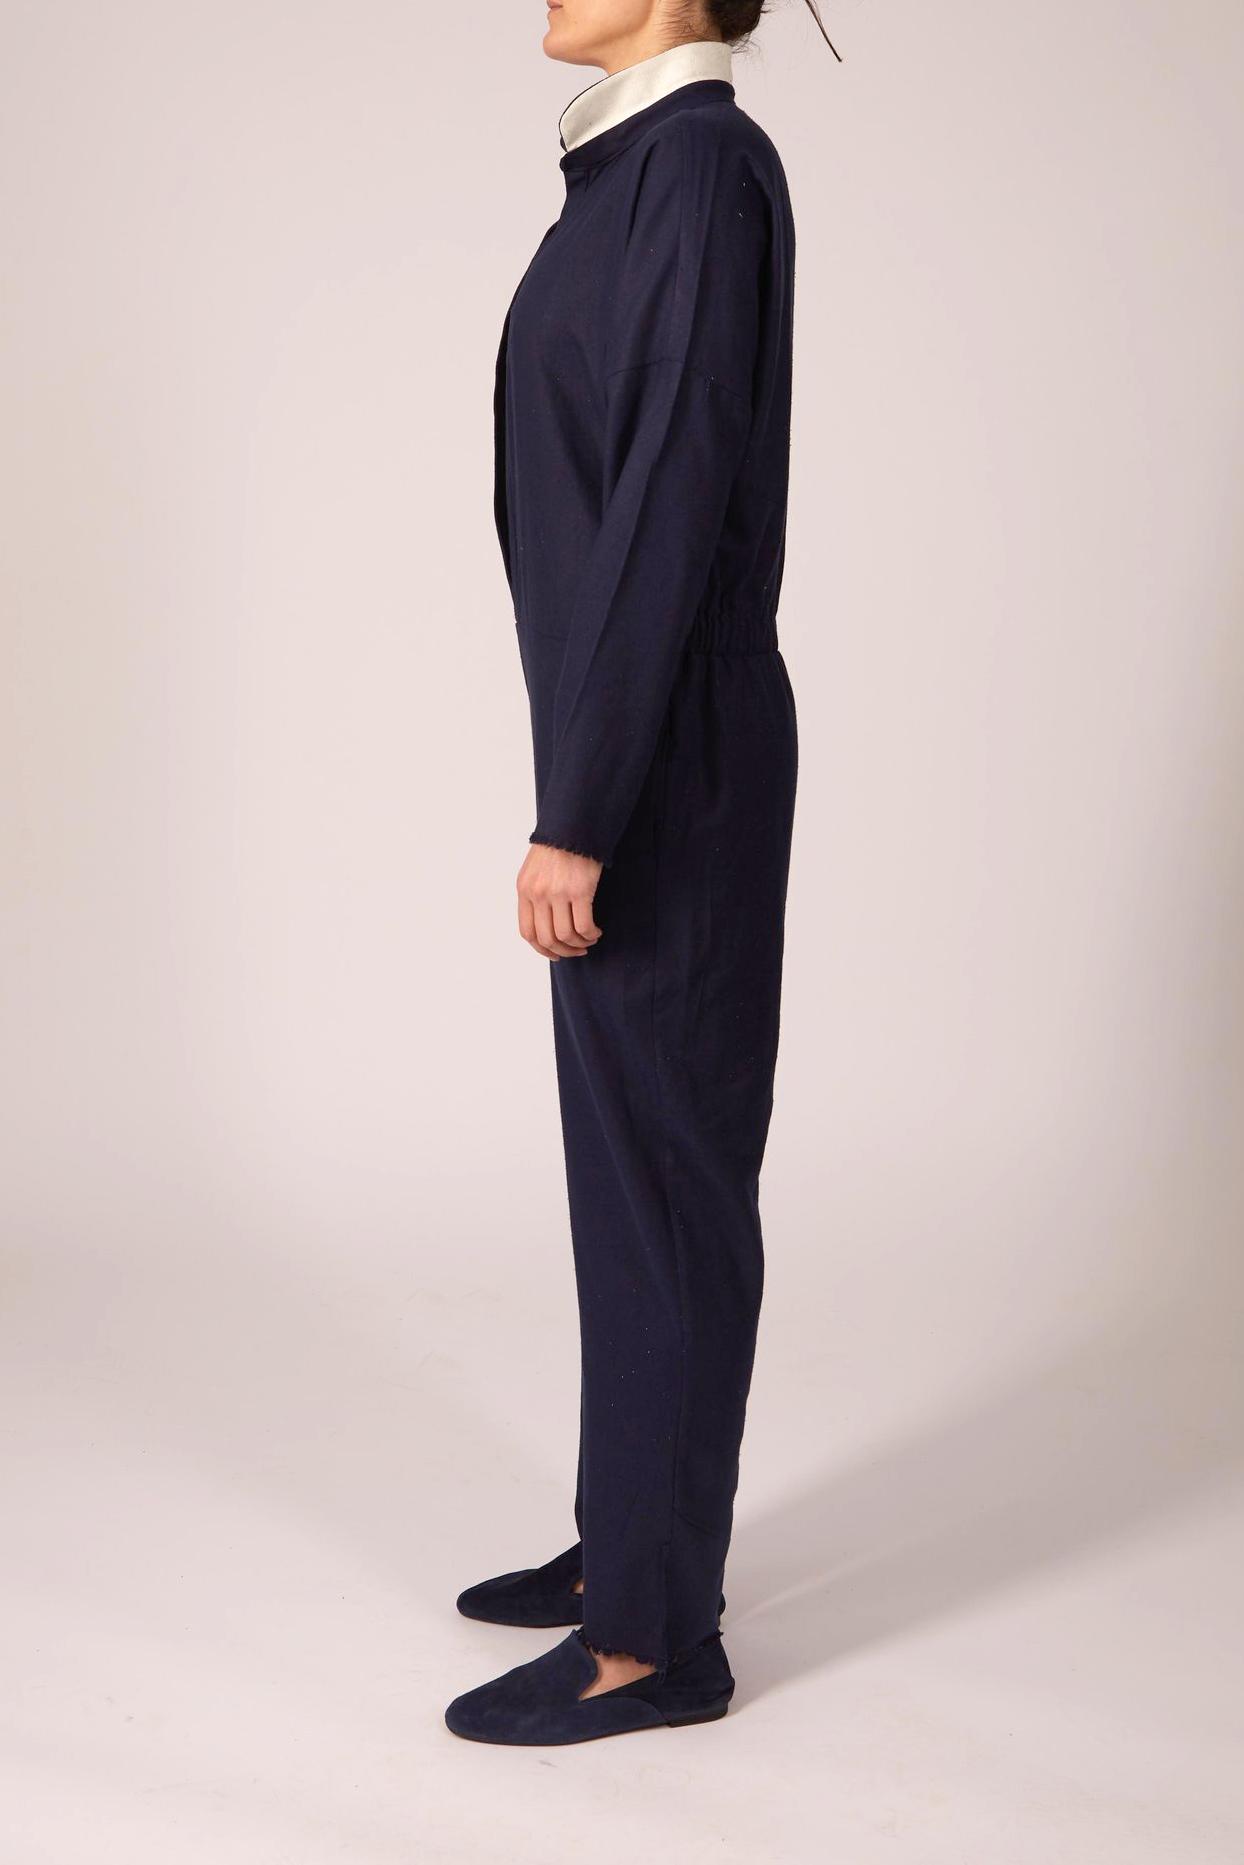 Wolcott+Robes09010046.jpg